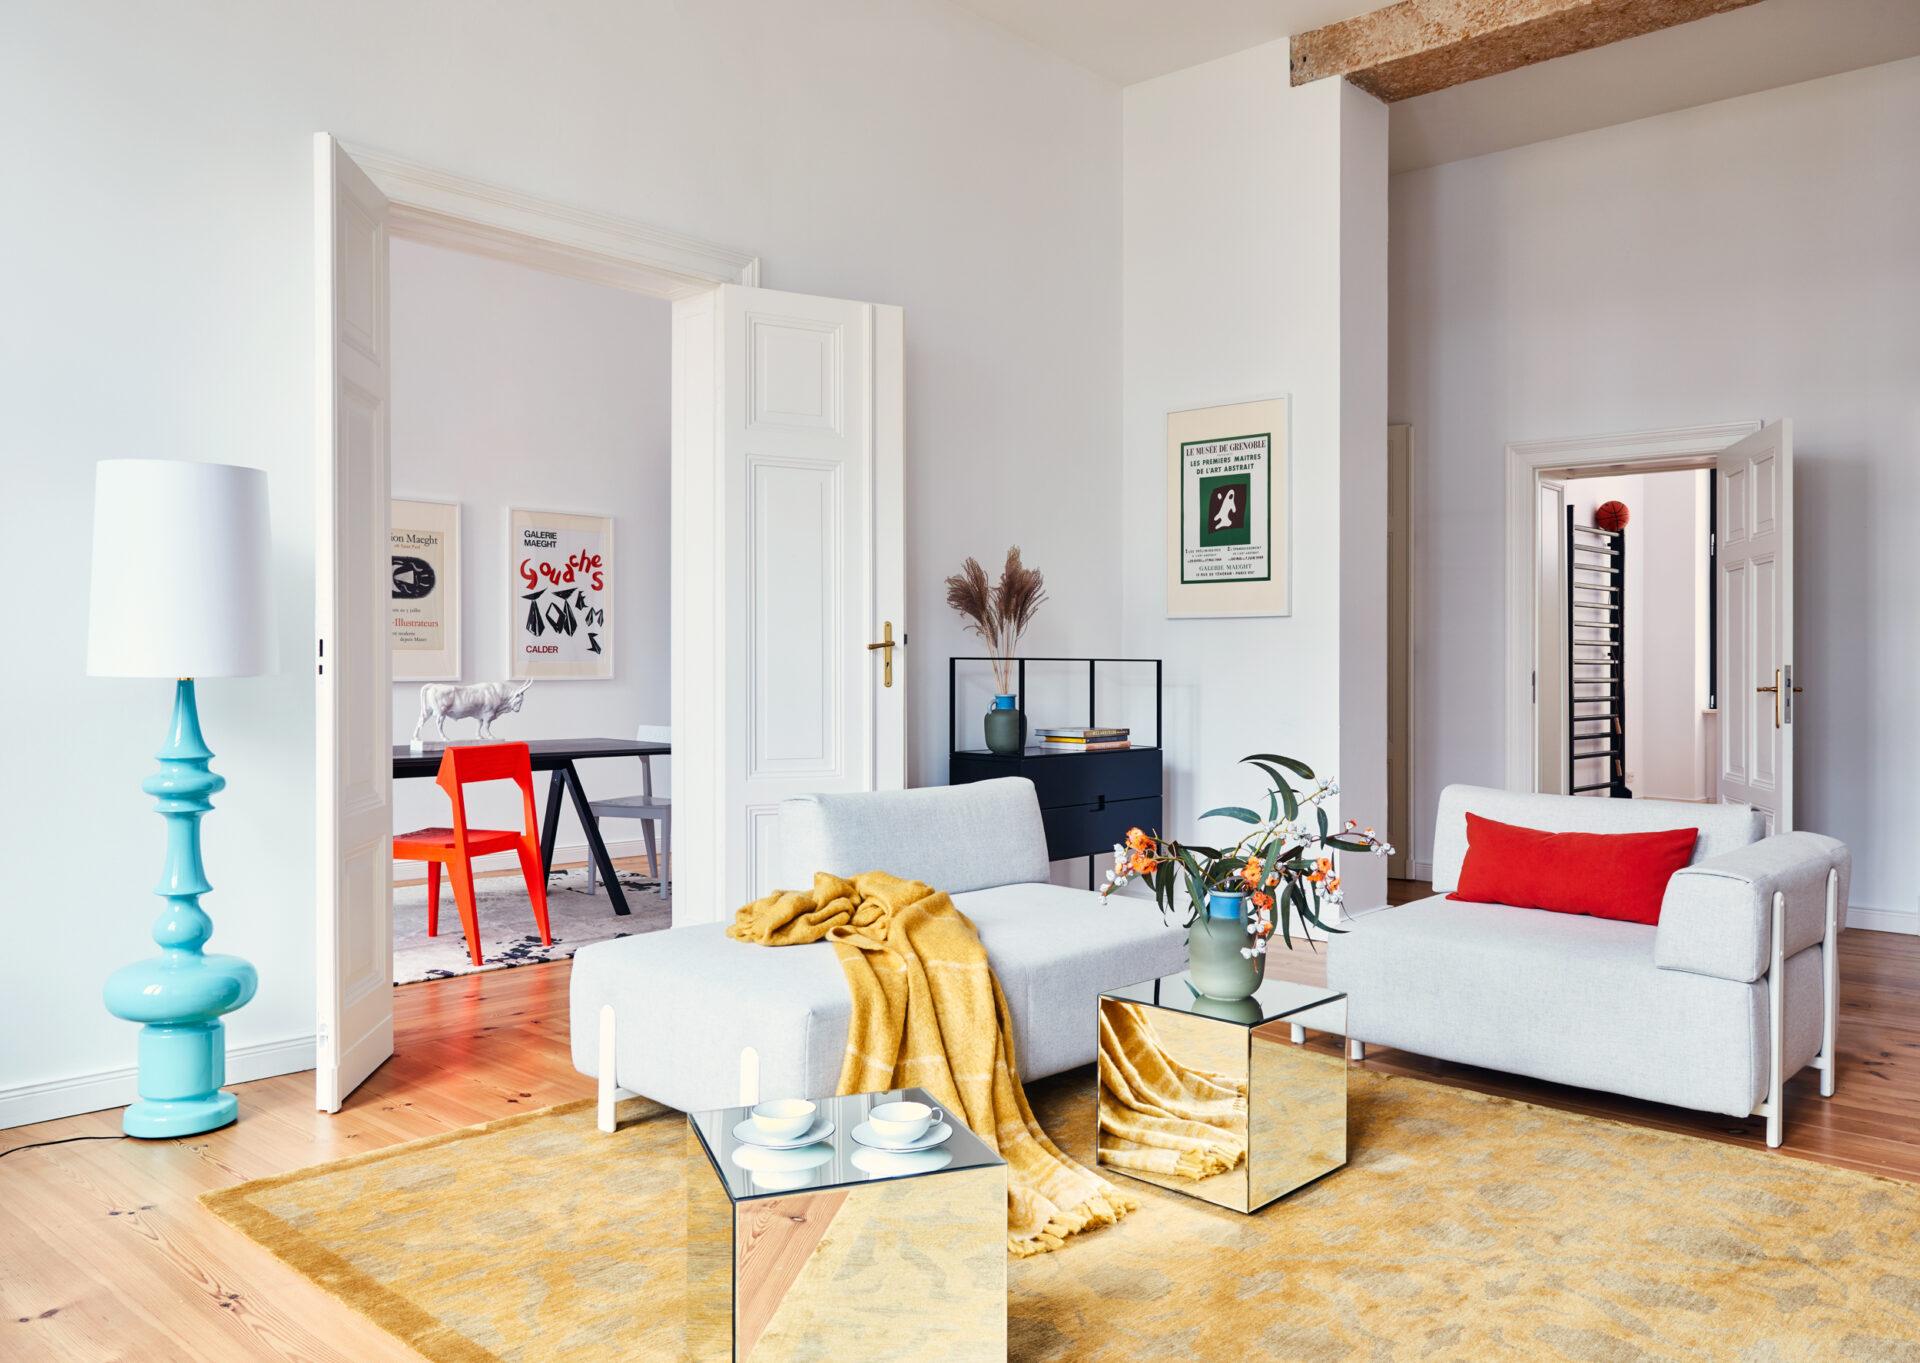 Antonius Schimmelbusch_Apartment Berlin_Ragnar Schmuck_David Borck_03